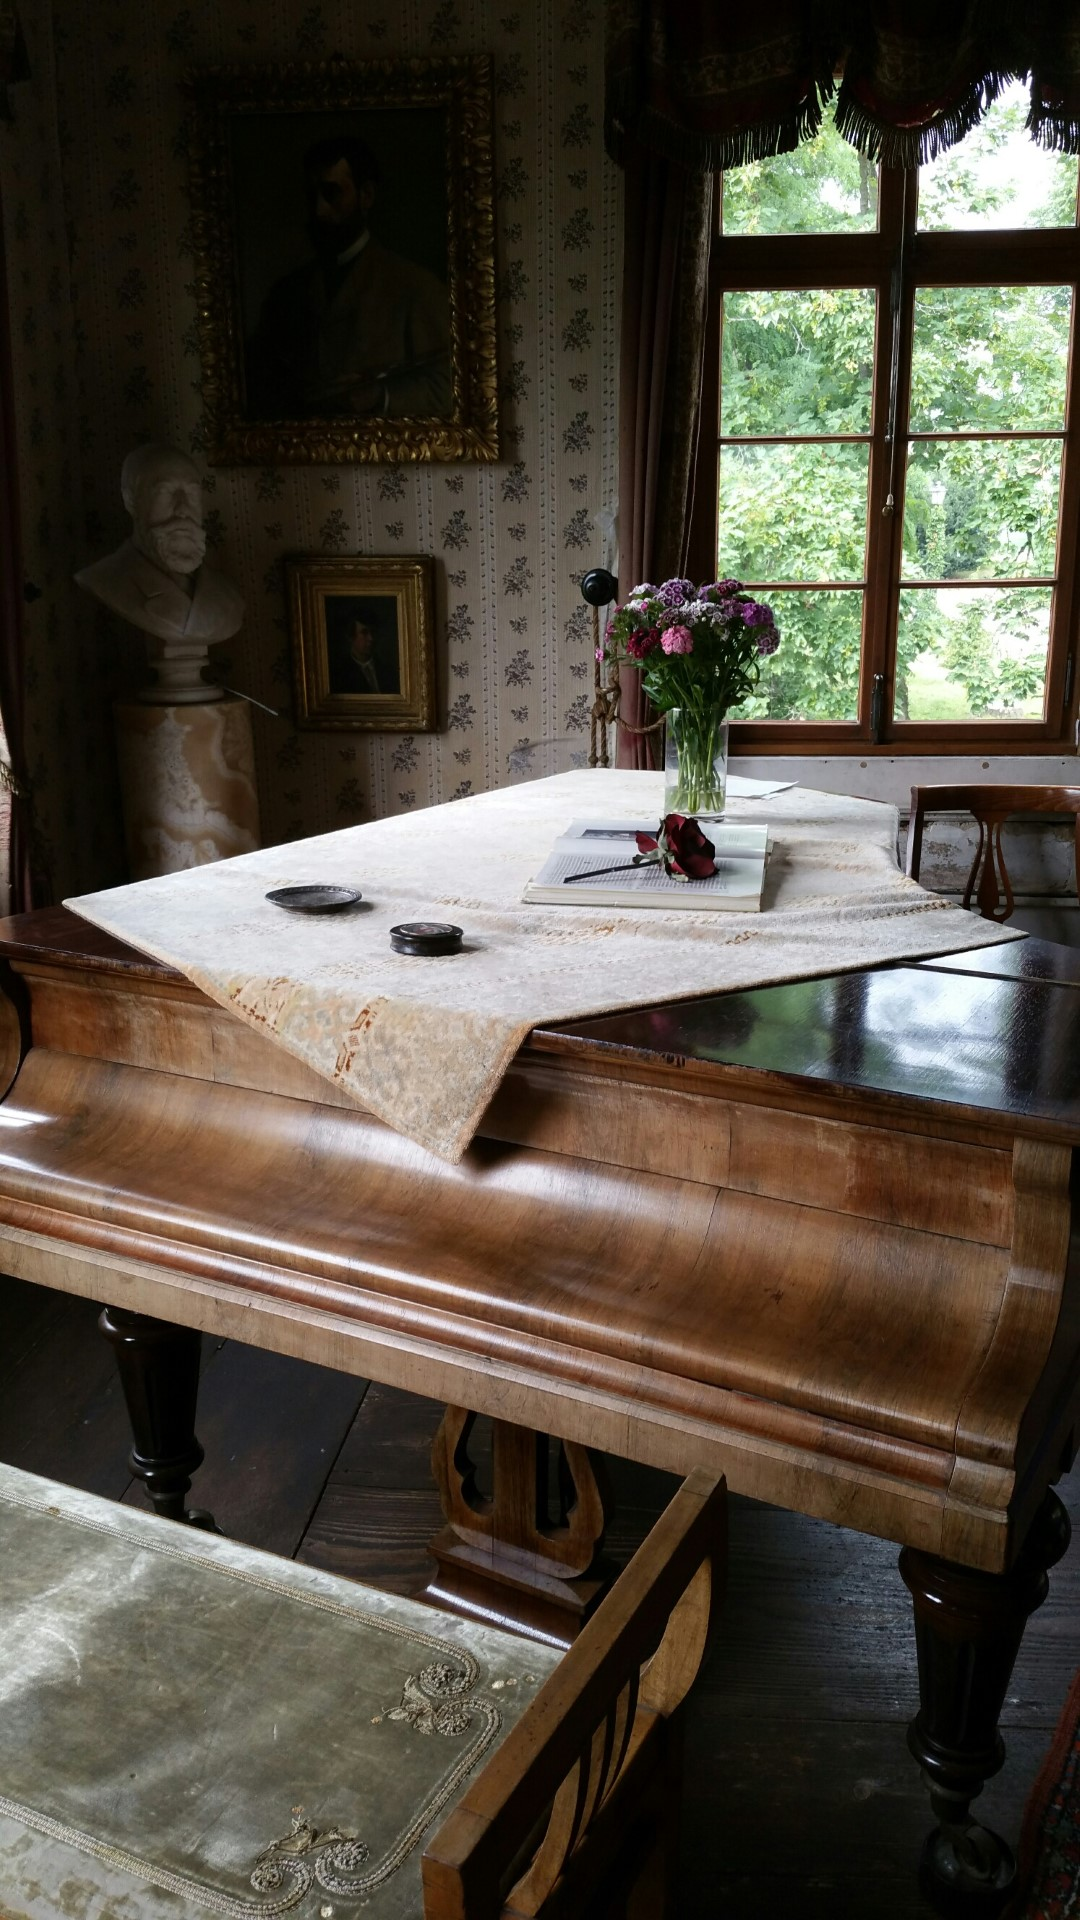 Blick in das Innere des Brentano-Hauses: Klavier